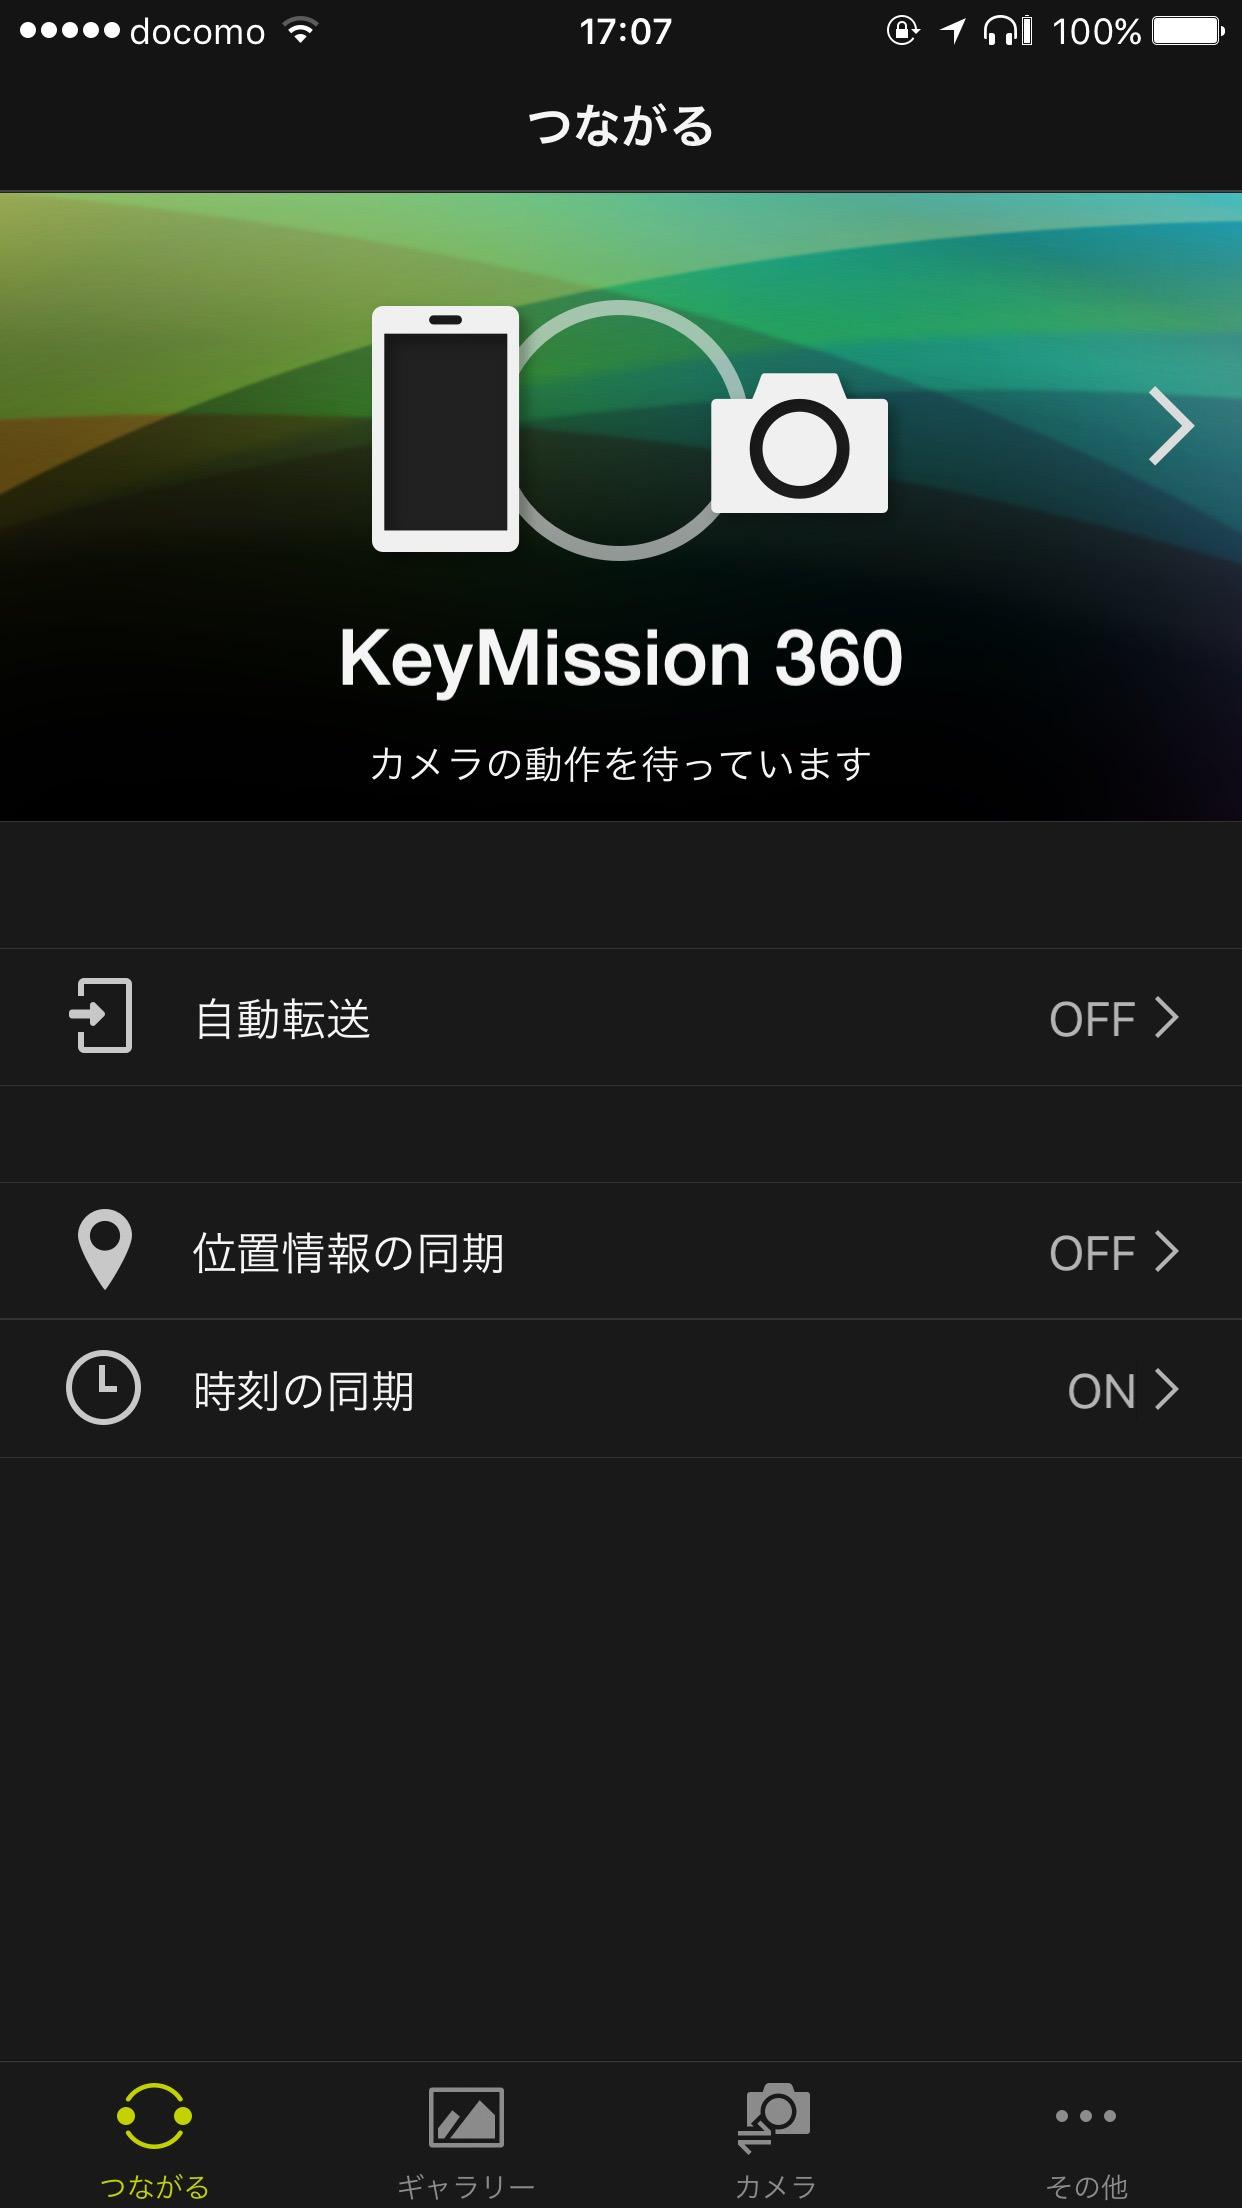 Key mission 360 3616